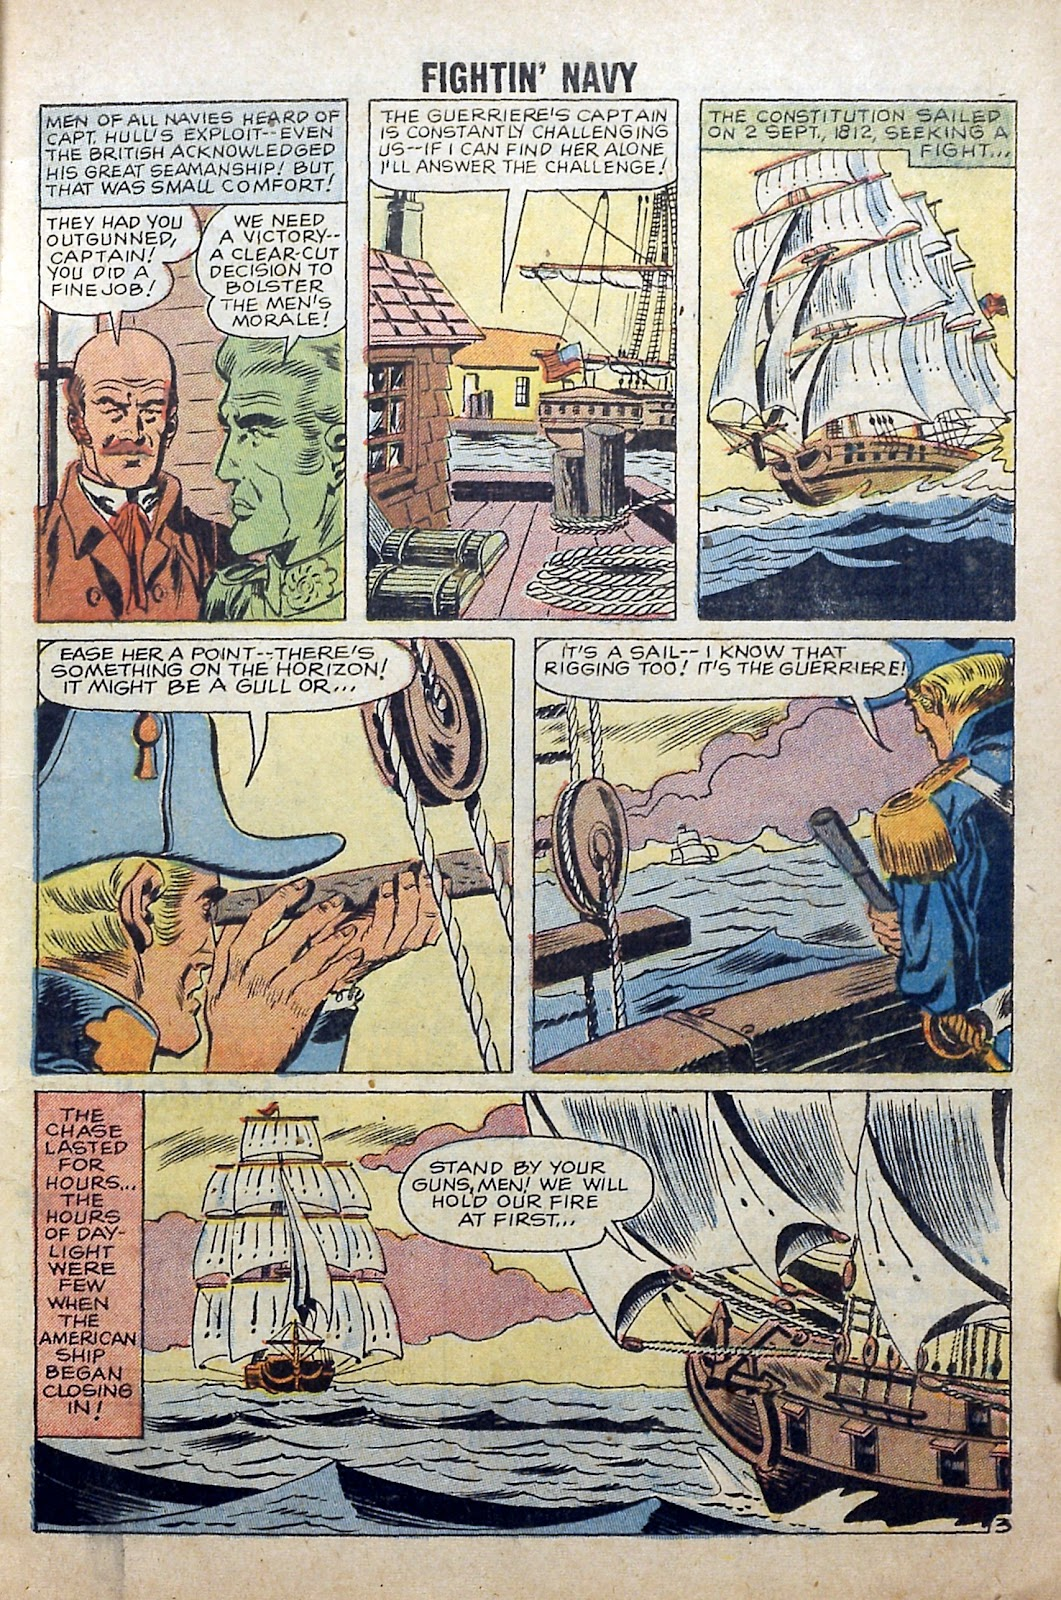 Read online Fightin' Navy comic -  Issue #84 - 5